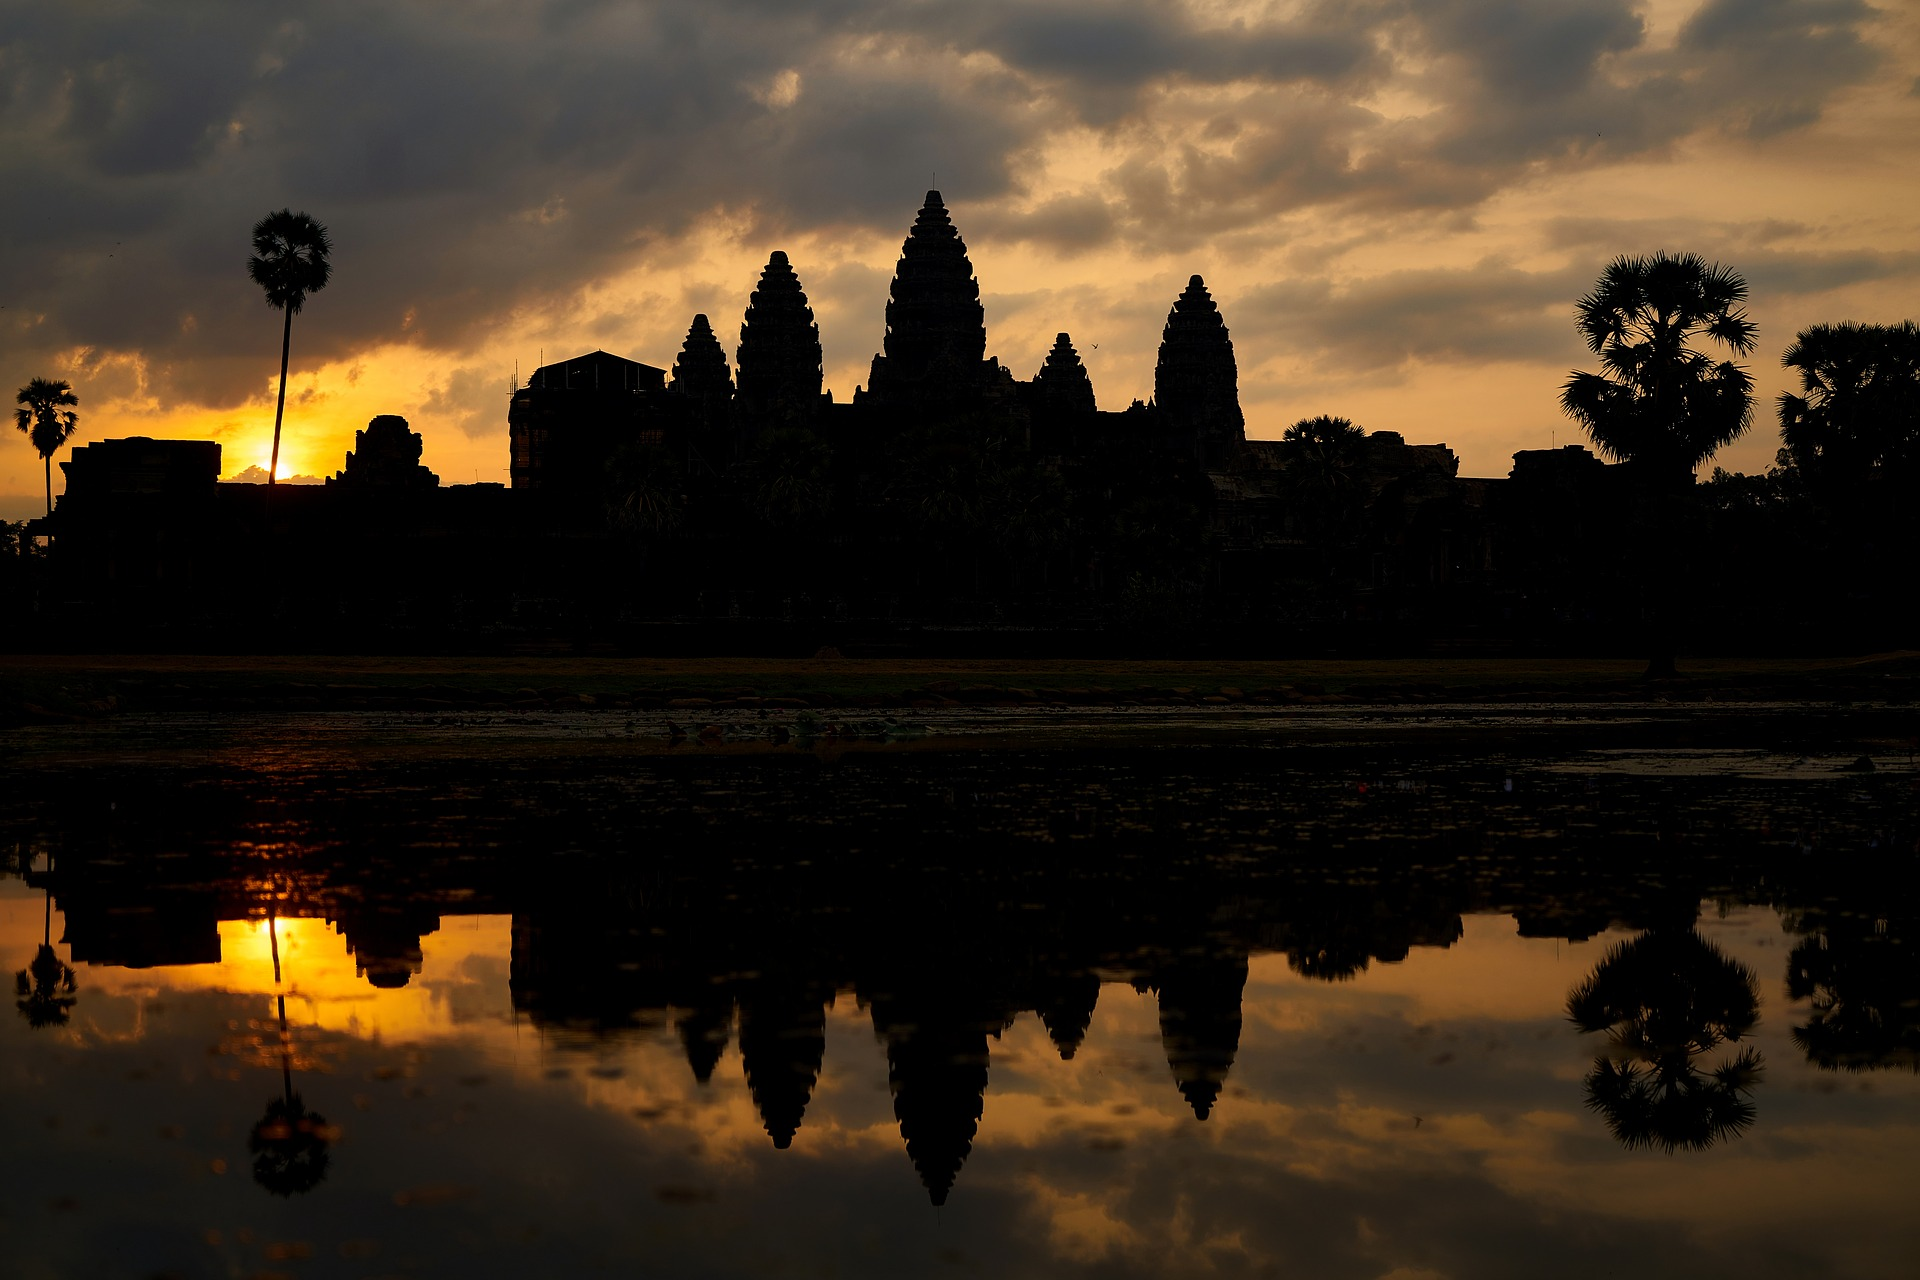 5. Siem Reap, Cambodia -